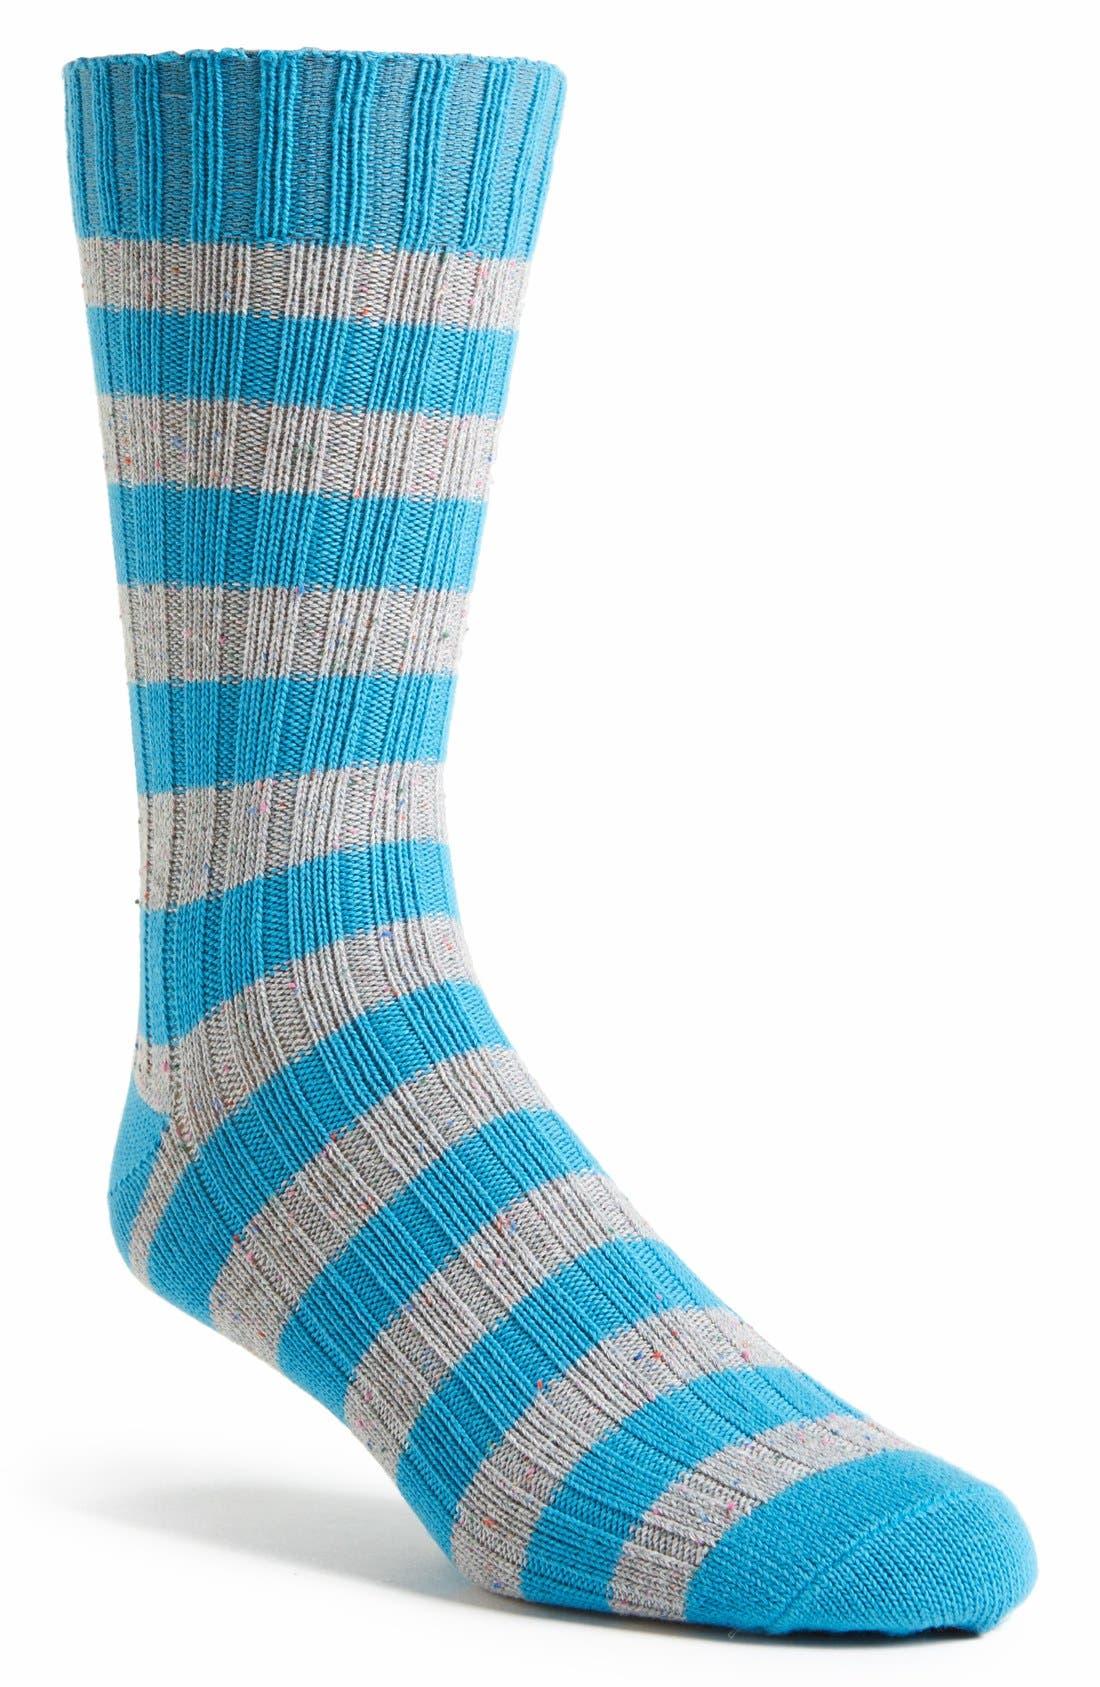 Alternate Image 1 Selected - PACT 'Confetti Stripe' Socks